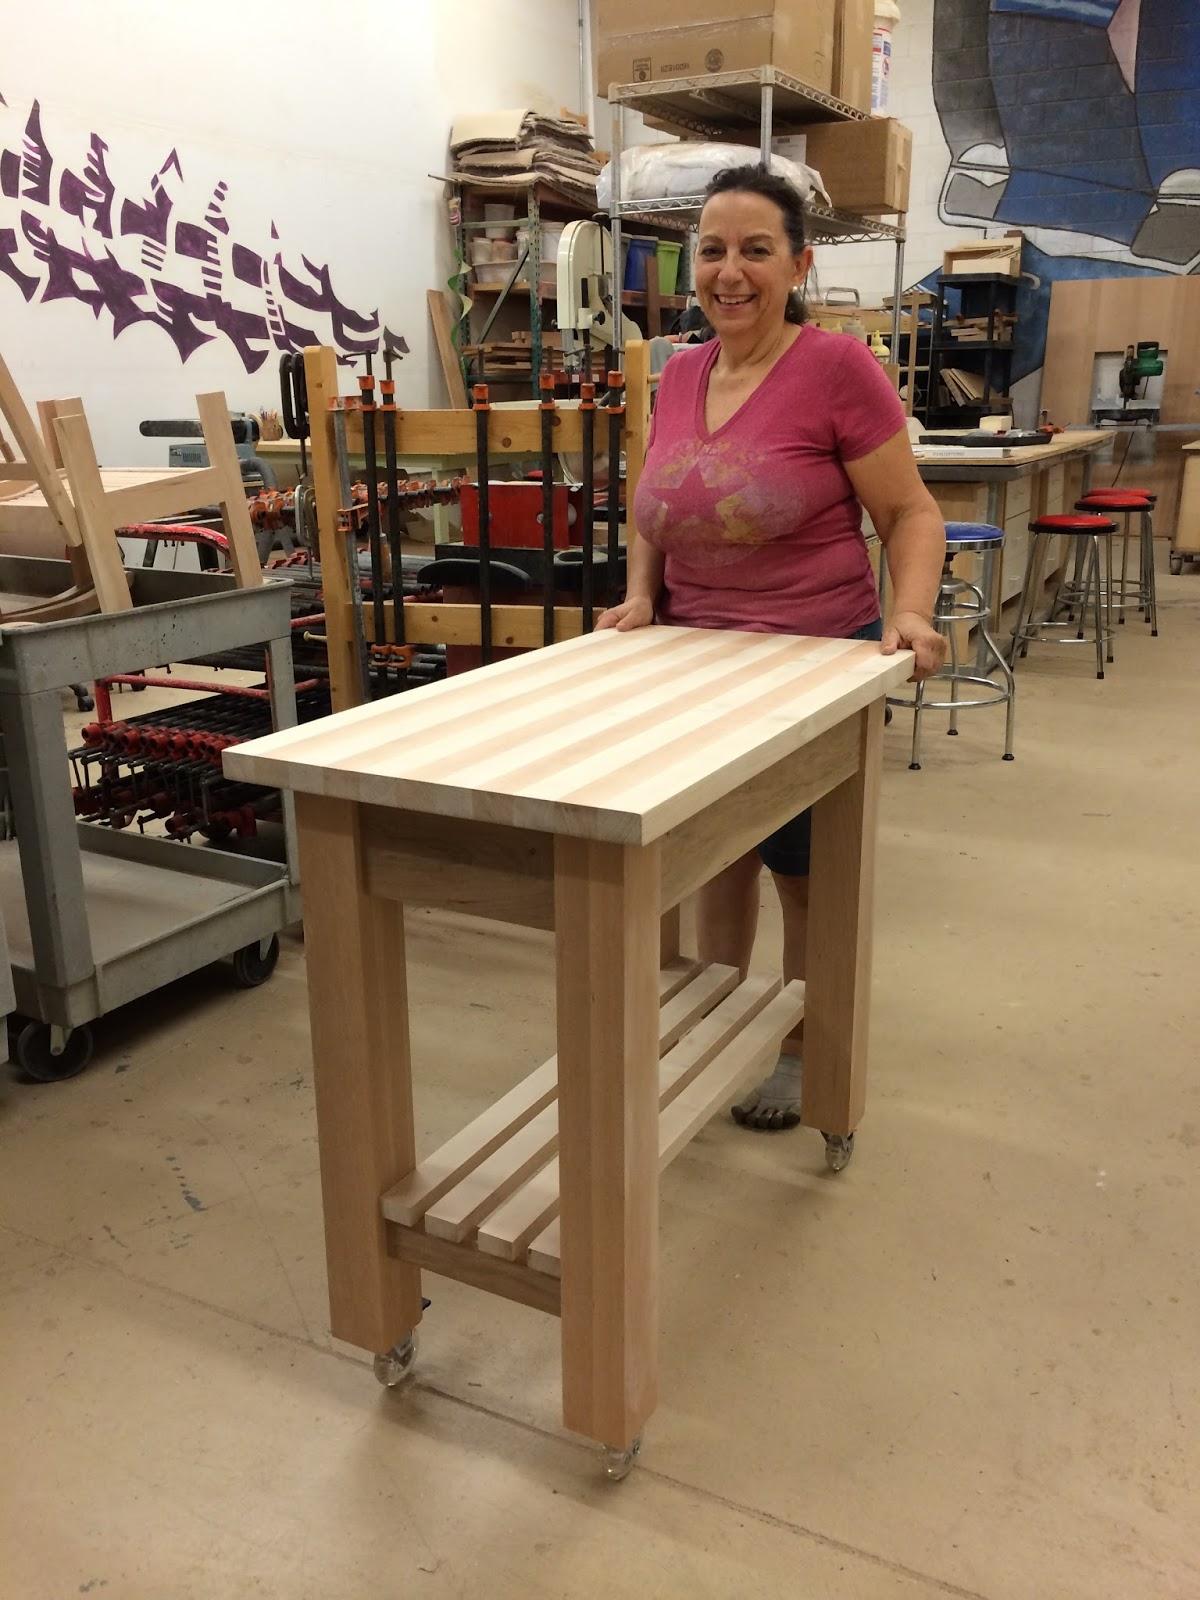 Woodworking classes in Las Vegas